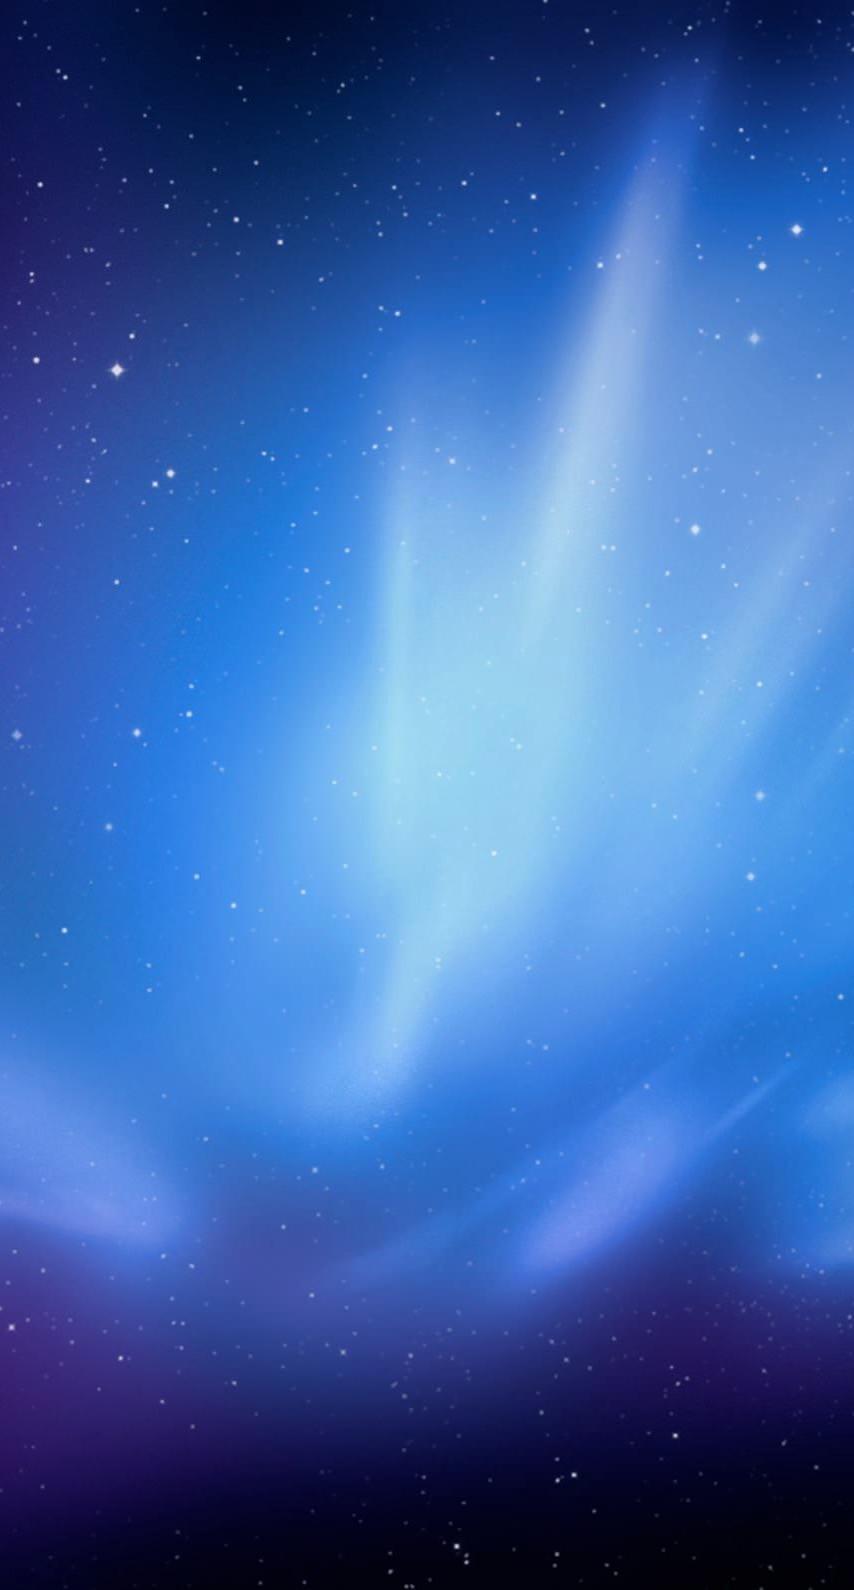 Space Blue Wallpaper Sc Iphone8